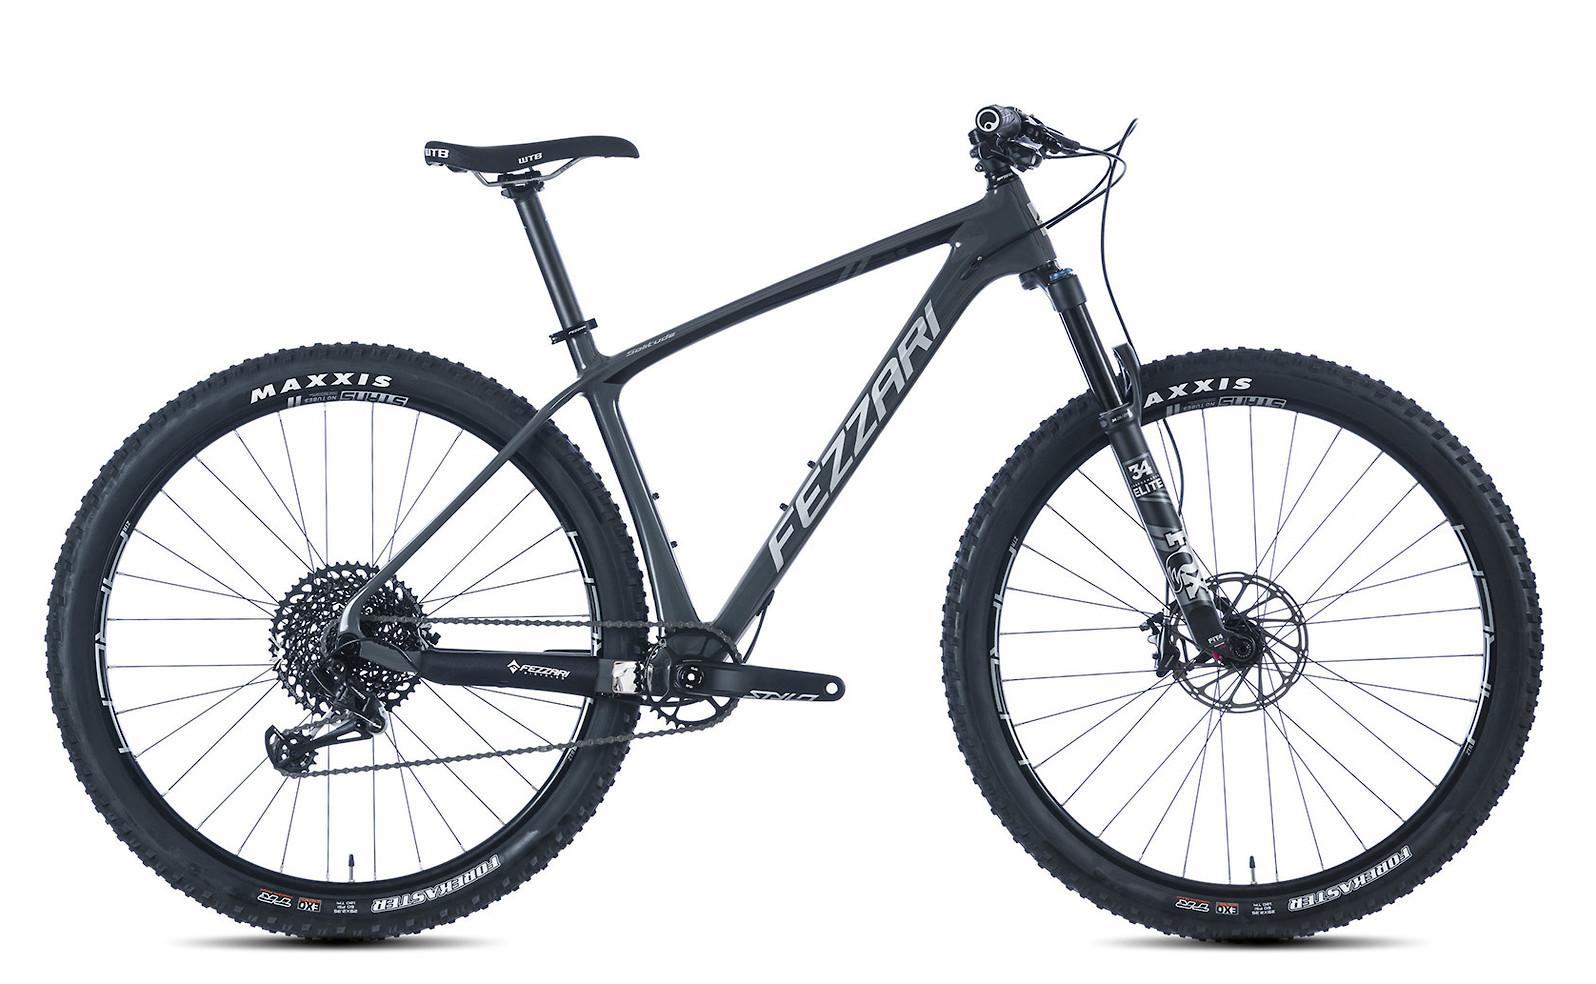 2019 Fezzari Solitude Elite Bike